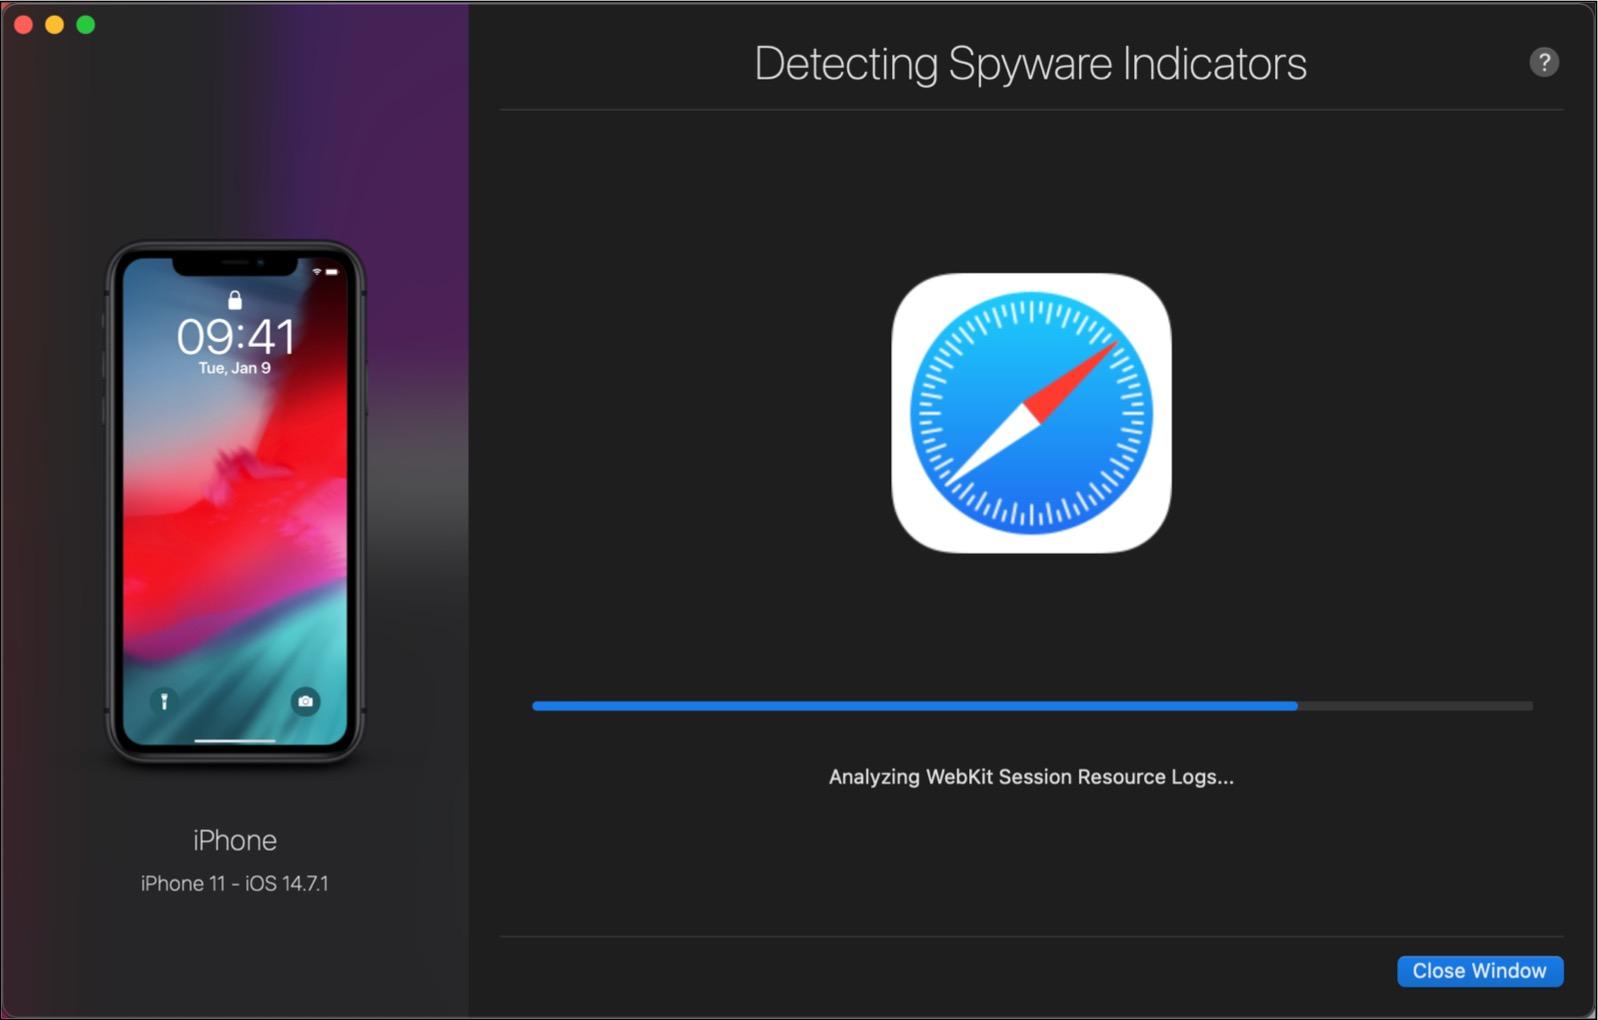 Spyware Indicators